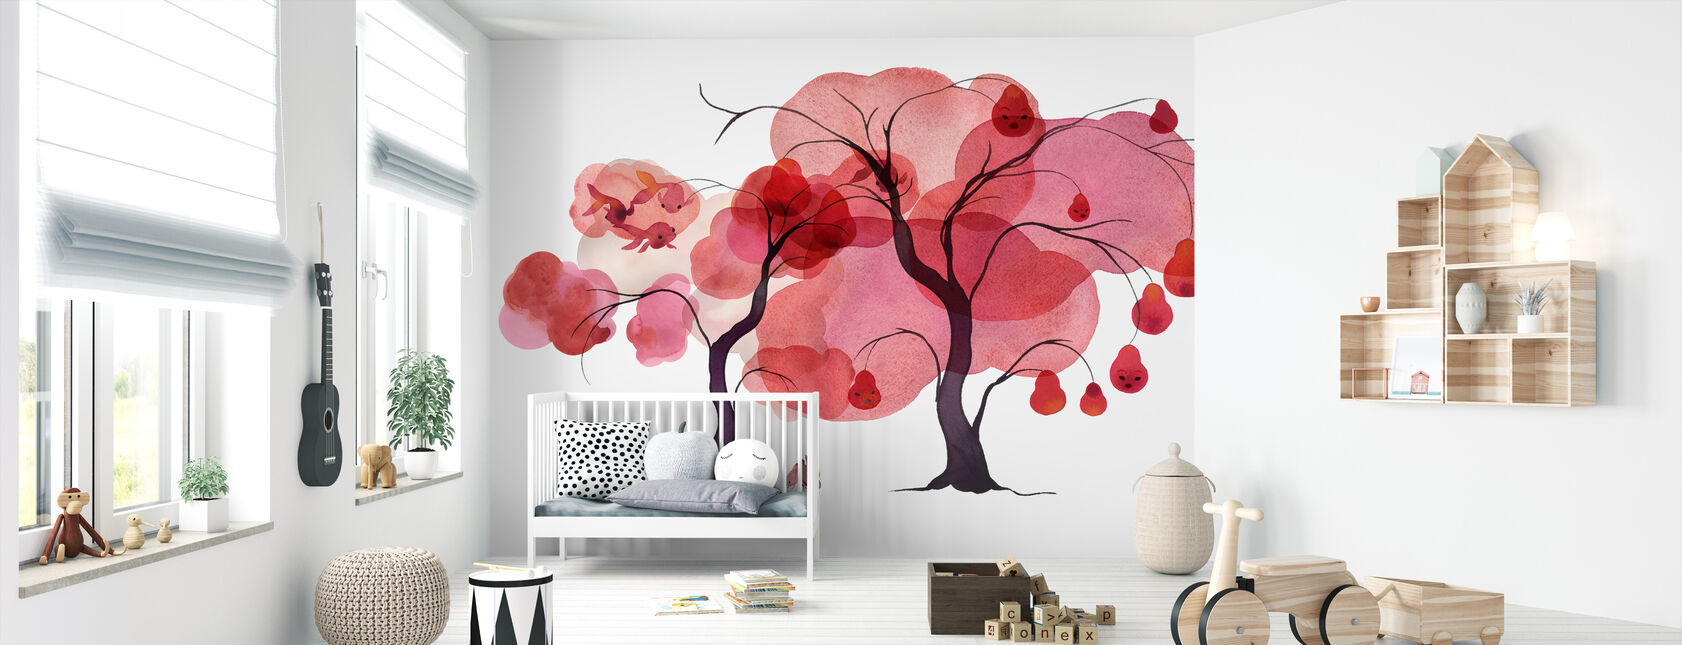 Vattenfärg Träd III - Tapet - Babyrum